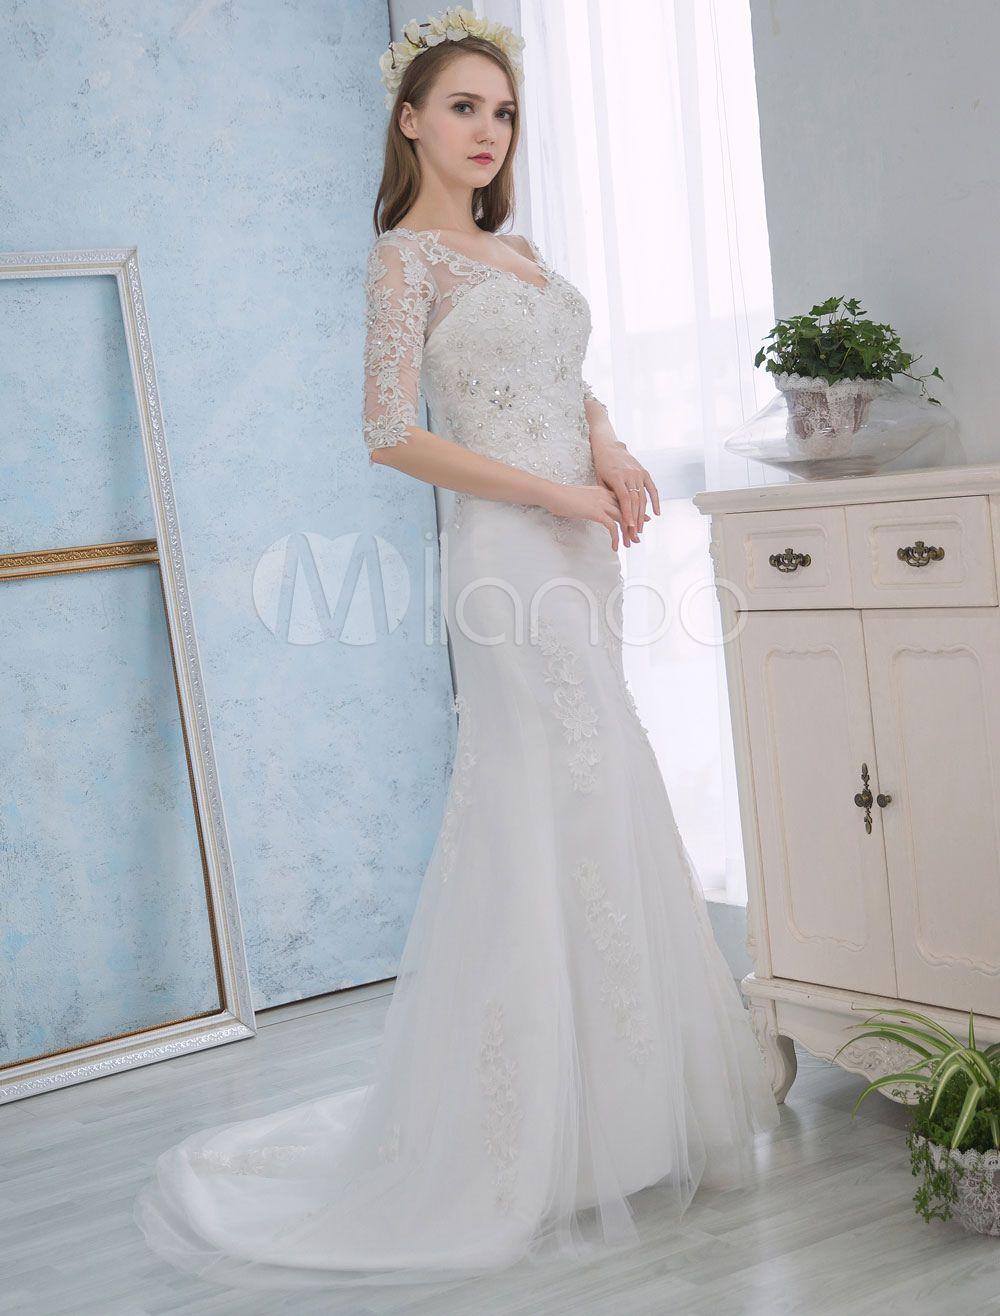 Mermaid Wedding Dresses Lace Half Sleeve Bridal Dress Backless